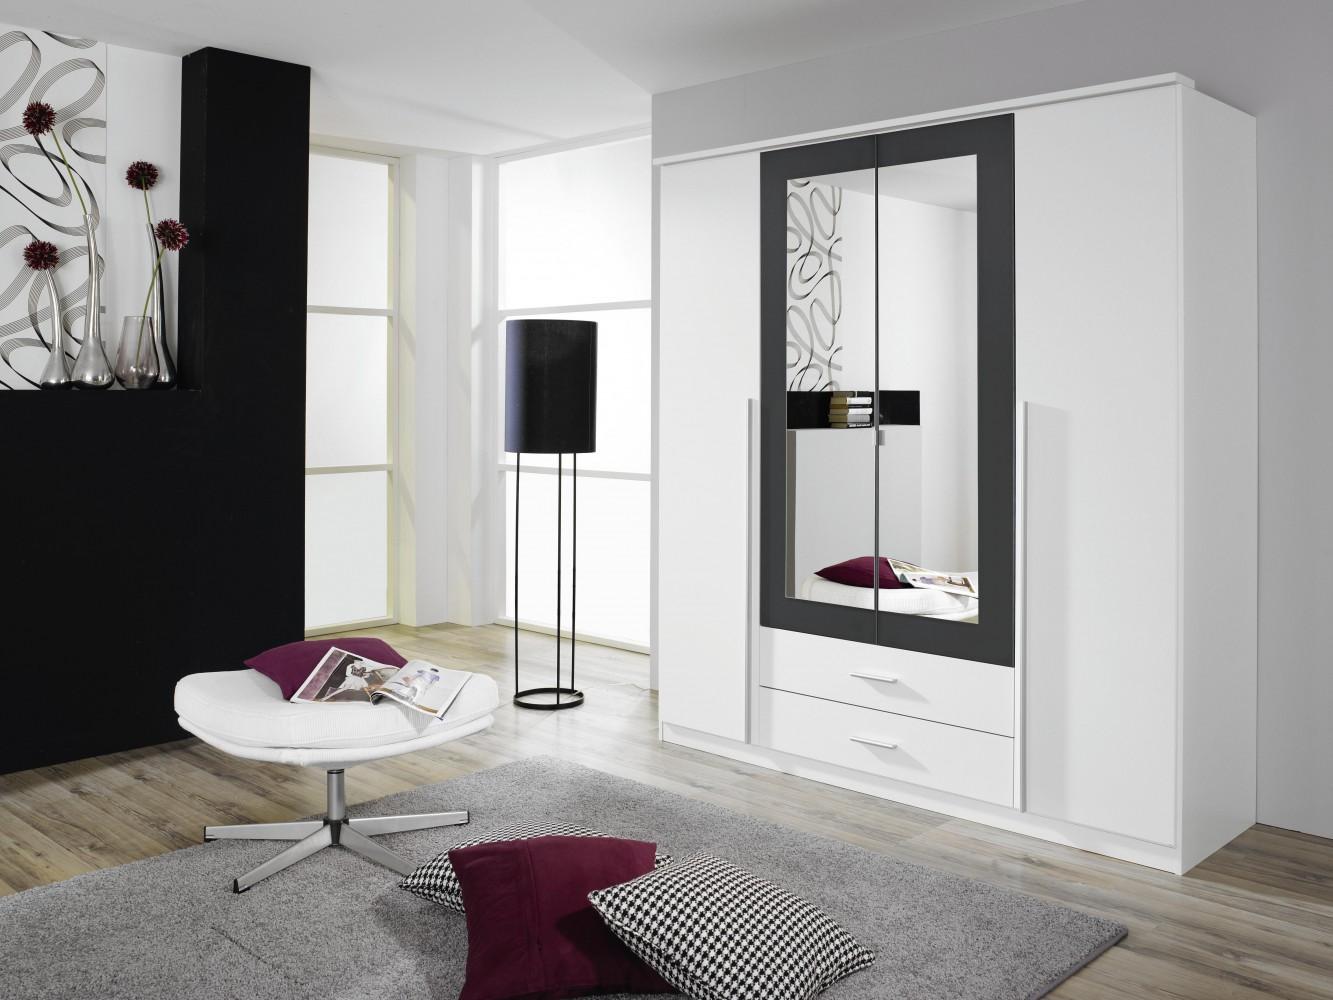 rauch krefeld kleiderschrank 4 trg alpinweiss grau. Black Bedroom Furniture Sets. Home Design Ideas